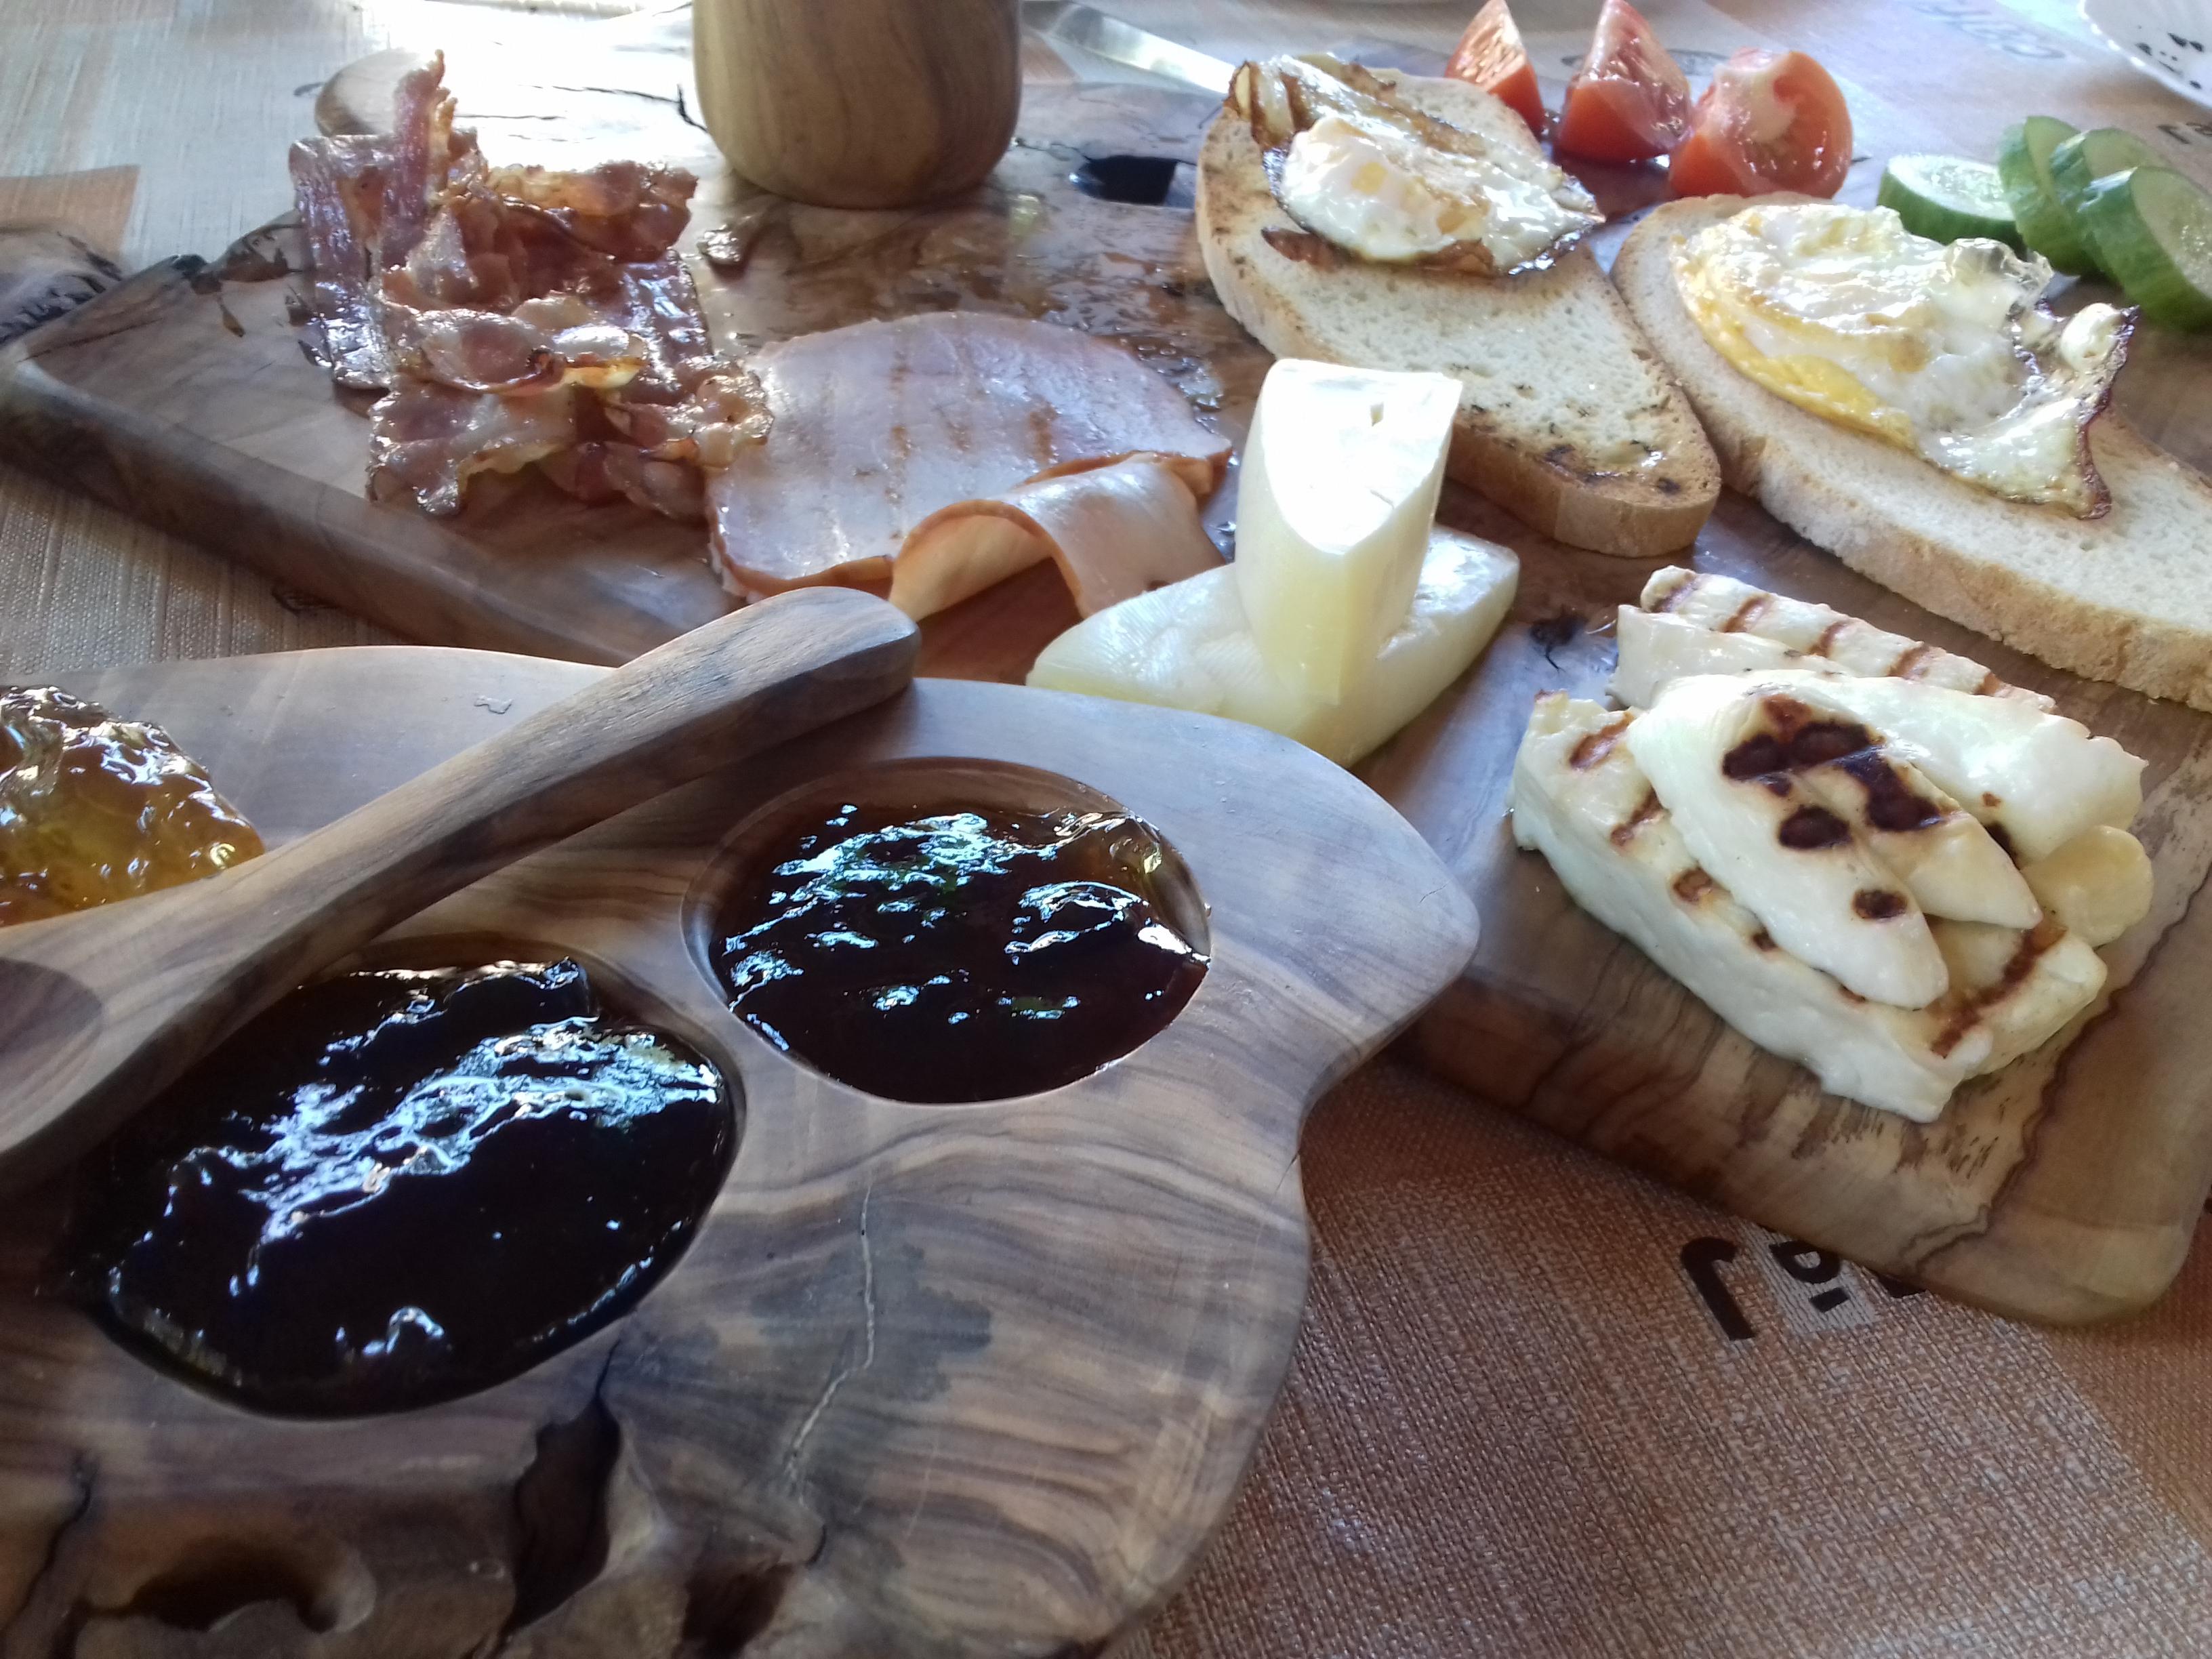 Amazing traditional food (halloumi, eggs, fresh baked aggs)